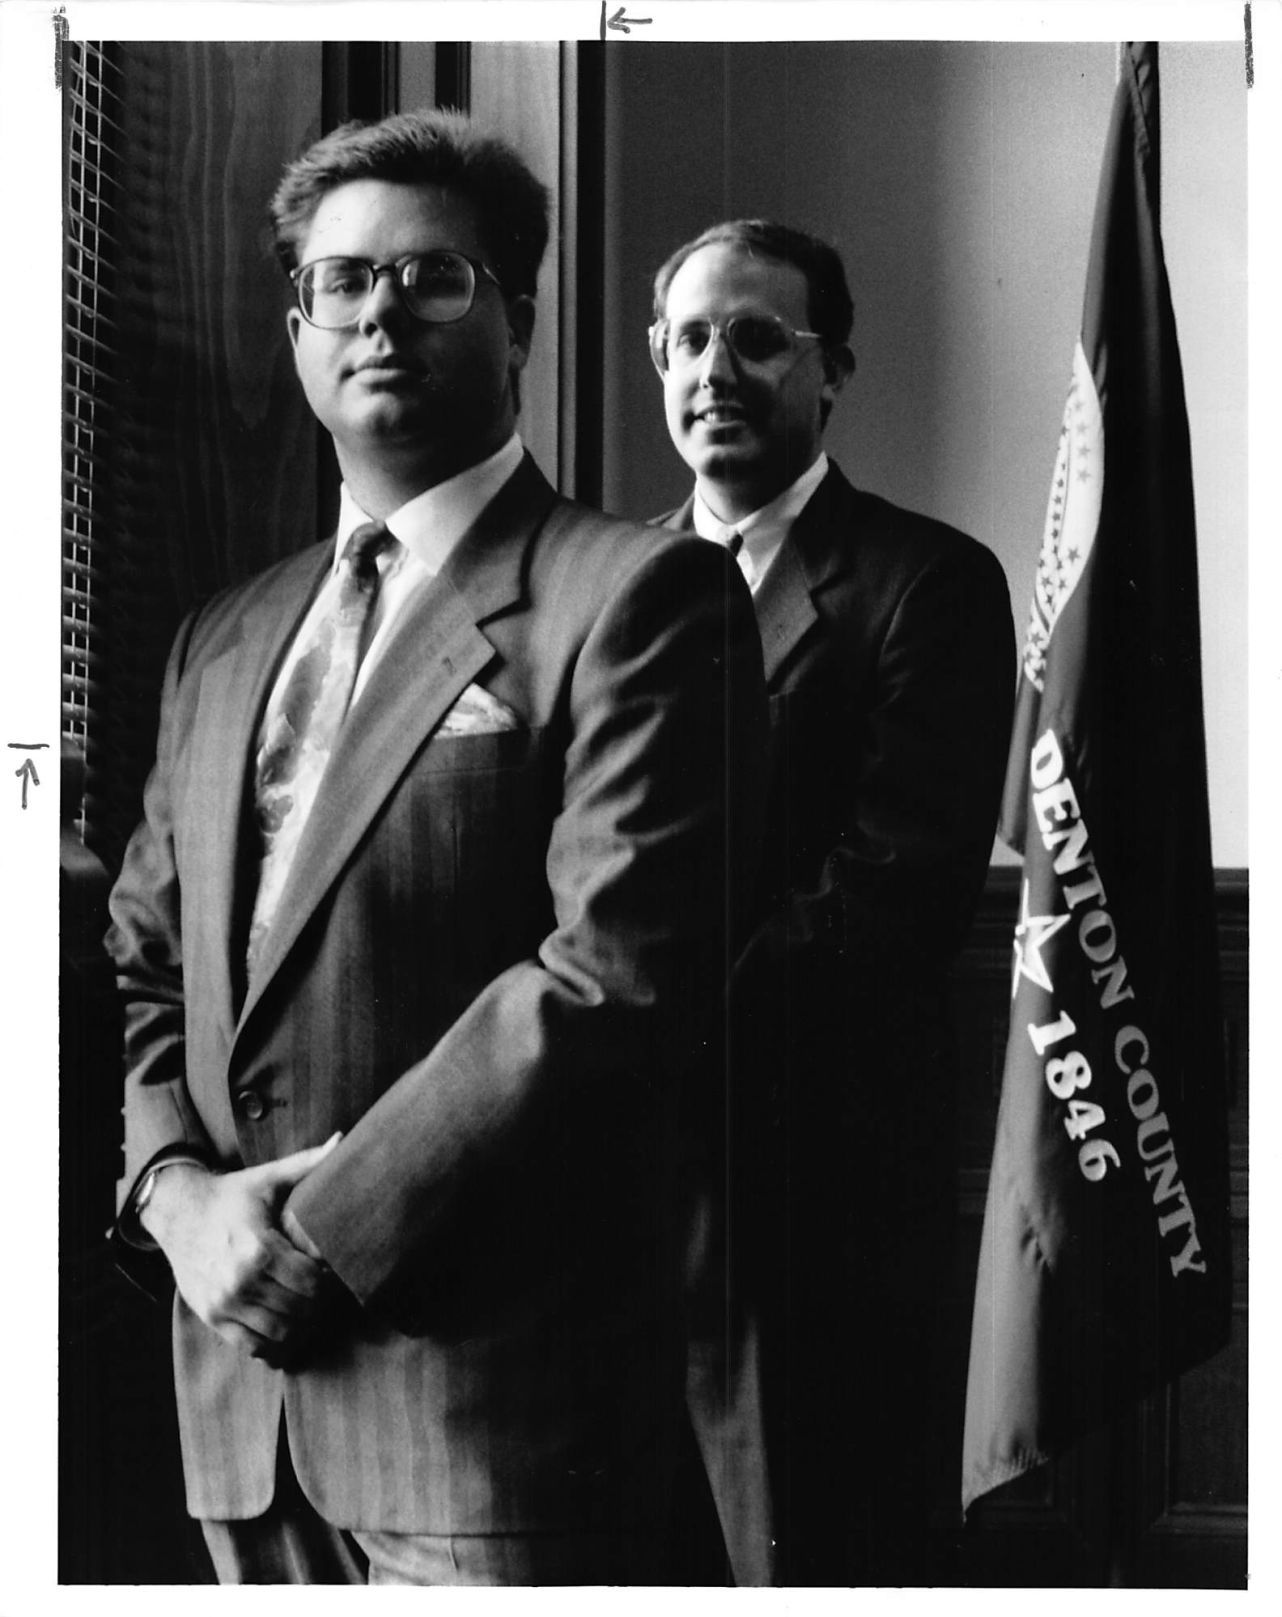 Scott Armey and Kirk Wilson